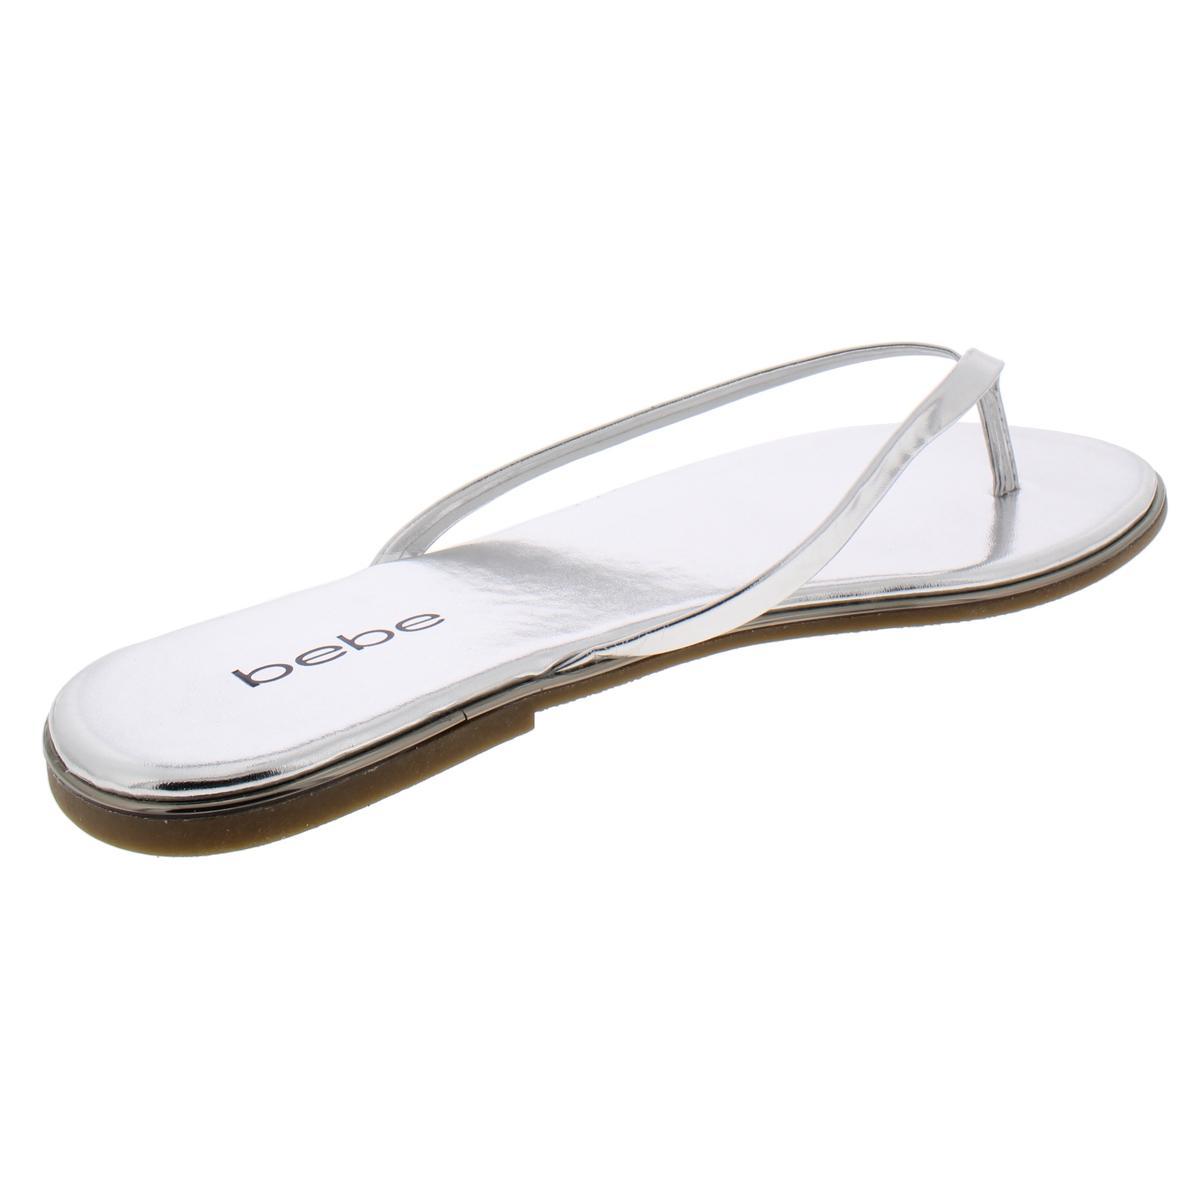 Bebe-Womens-Ilistra-Patent-Slide-Flip-Flops-Shoes-BHFO-7633 thumbnail 8